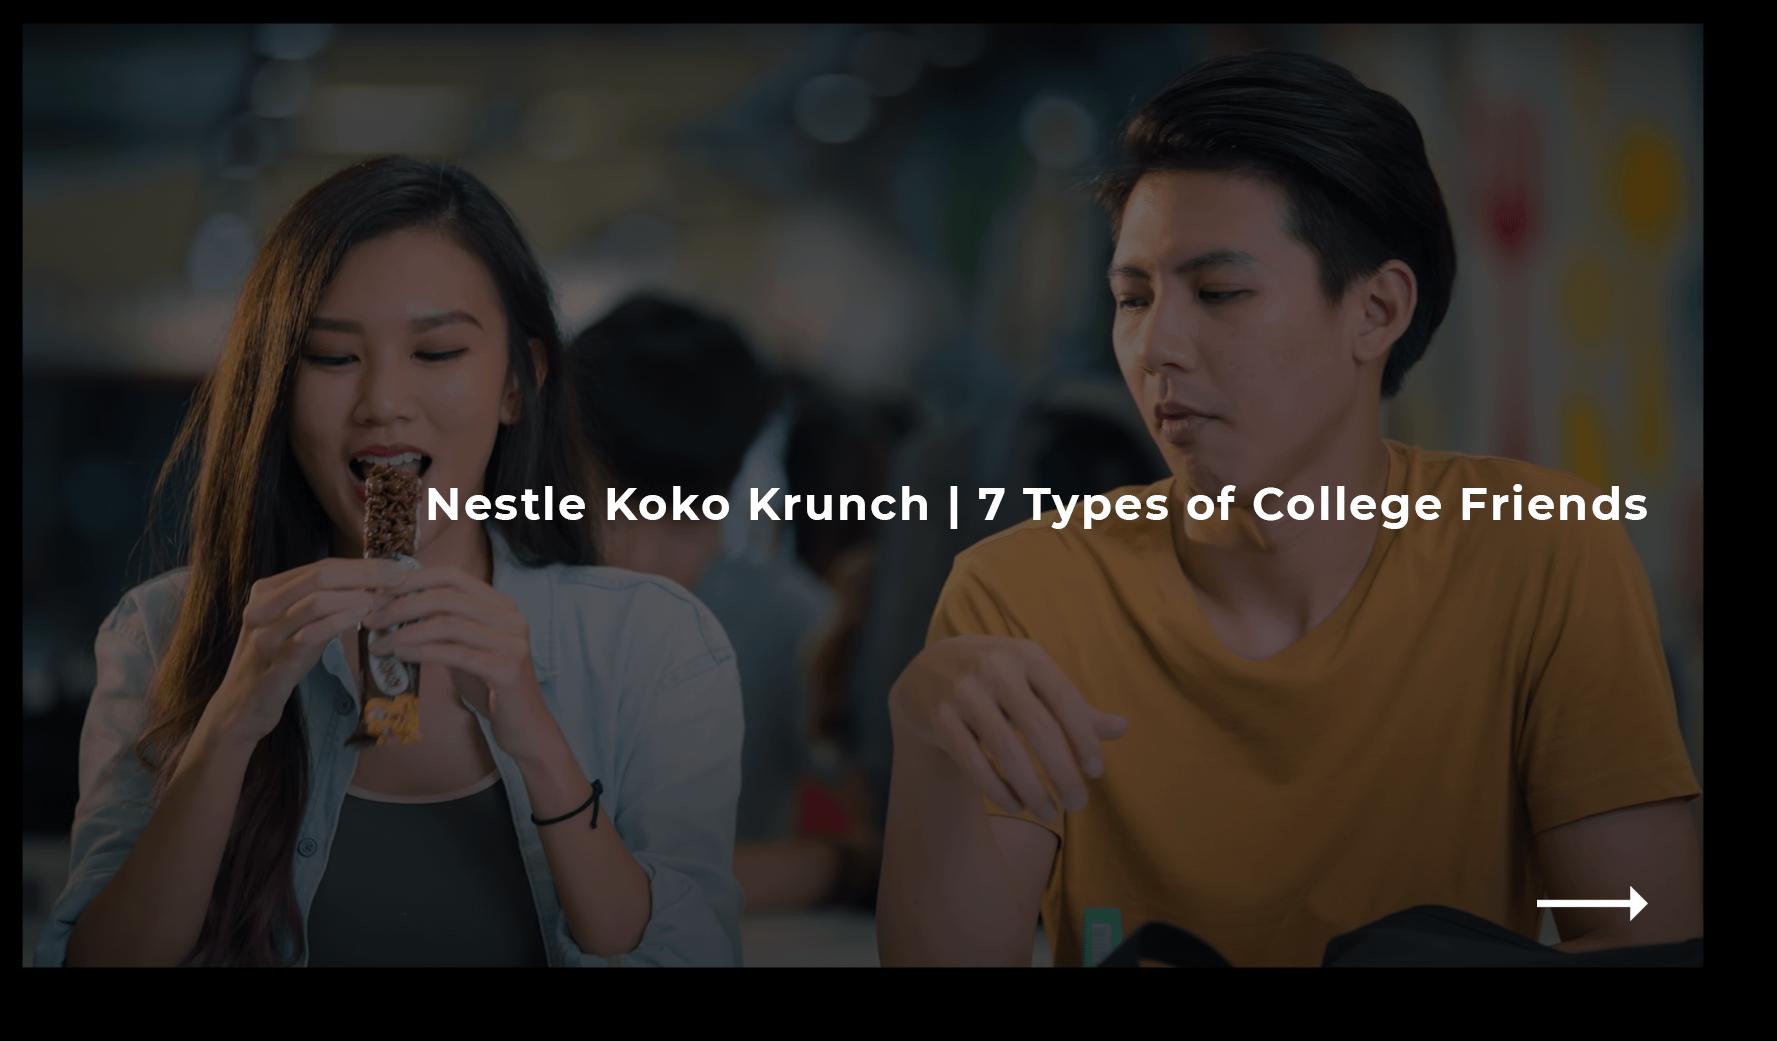 Nestle Koko Krunch - 7 Types of College Friends